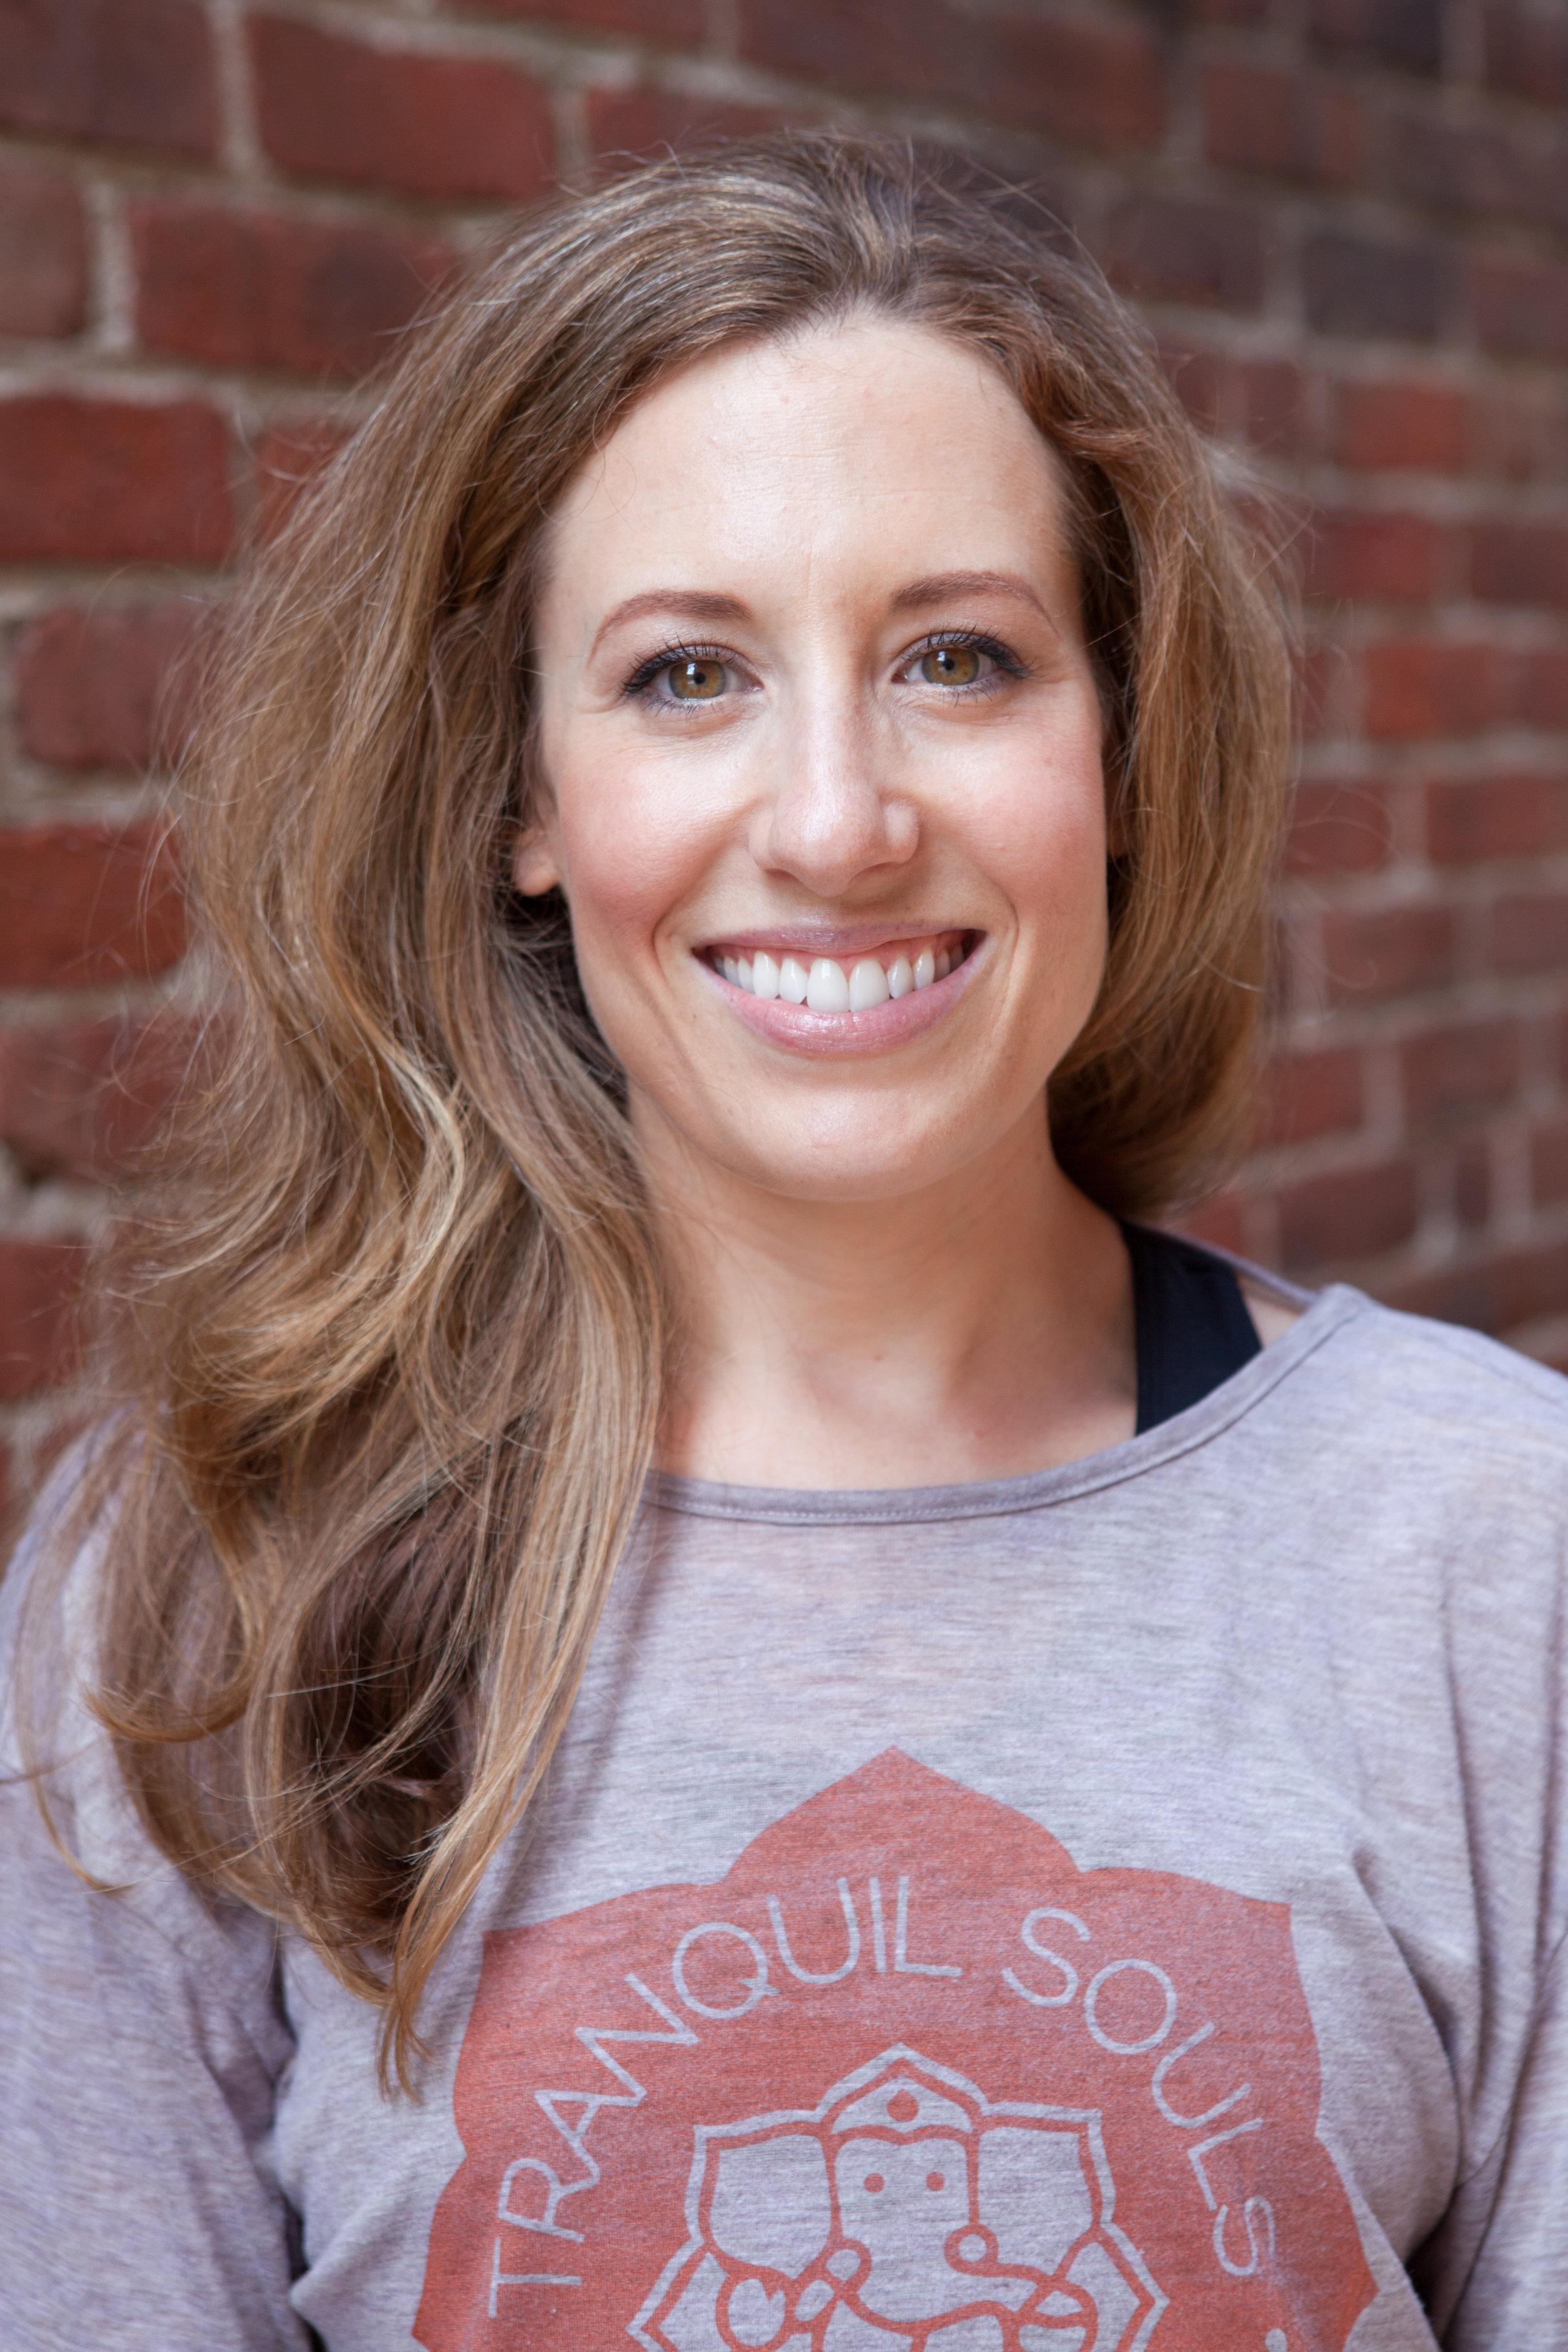 Courtney Bertulli